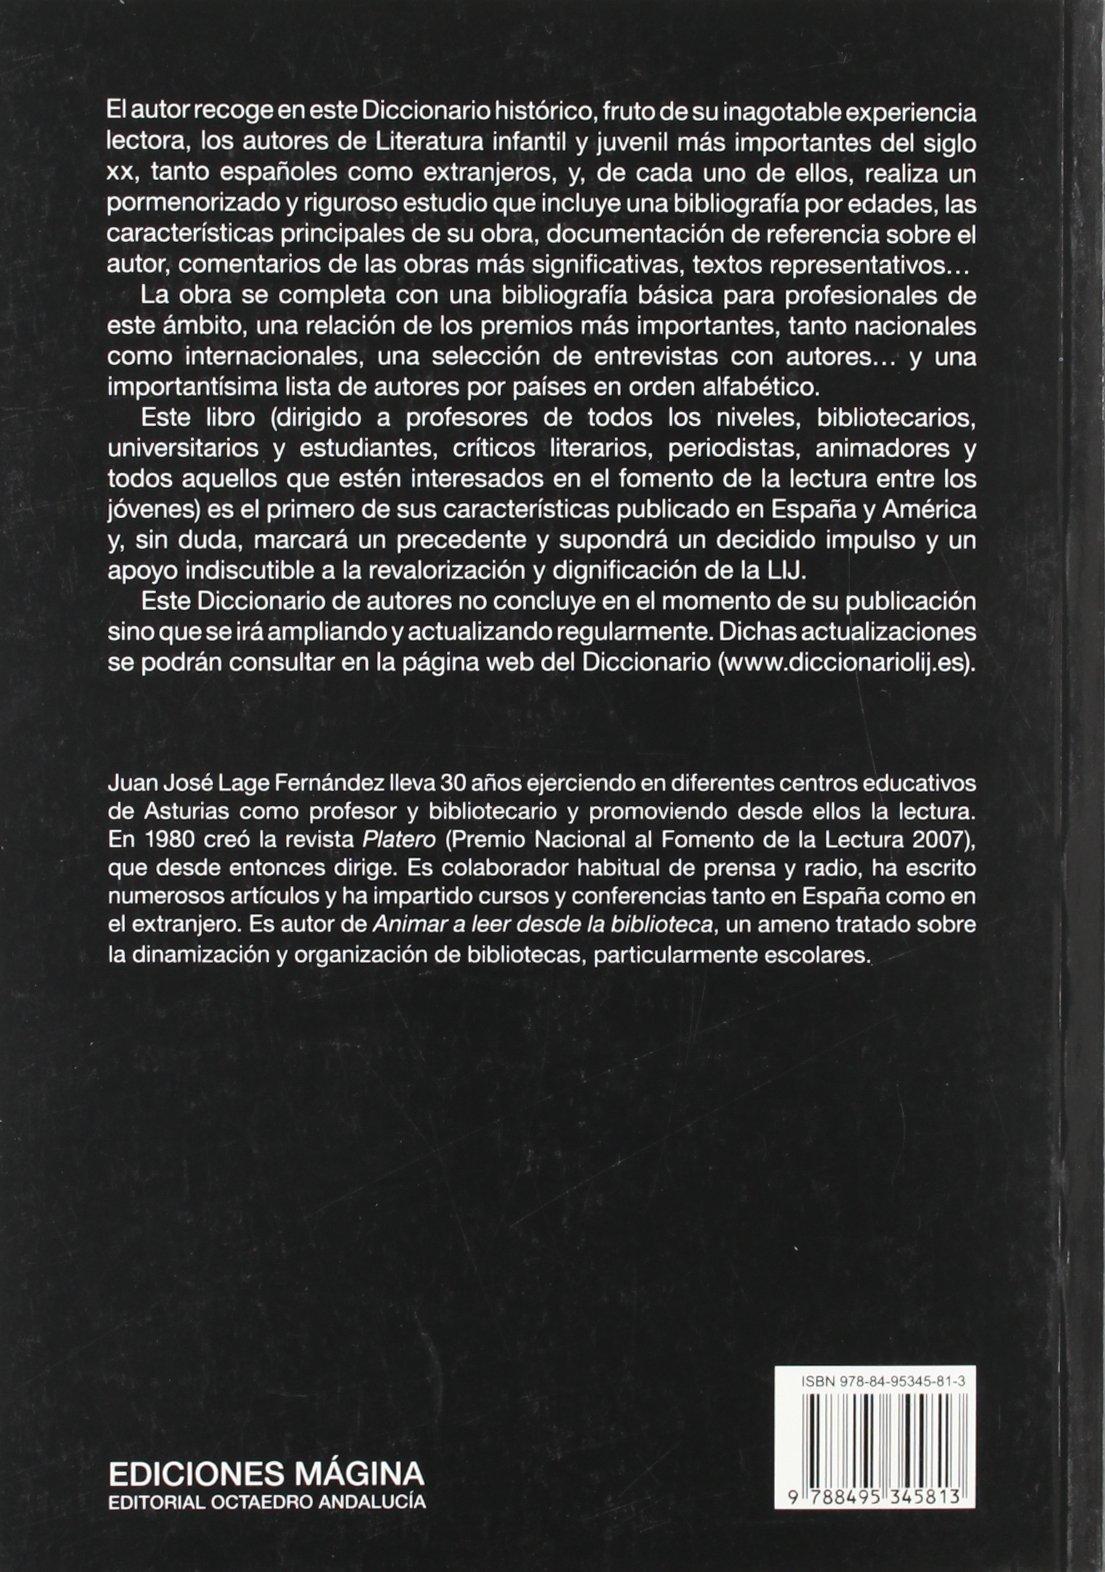 Historico de autores de la literatura infantil contemporanea: Juan José LAGE FERNÁNDEZ: 9788495345813: Amazon.com: Books